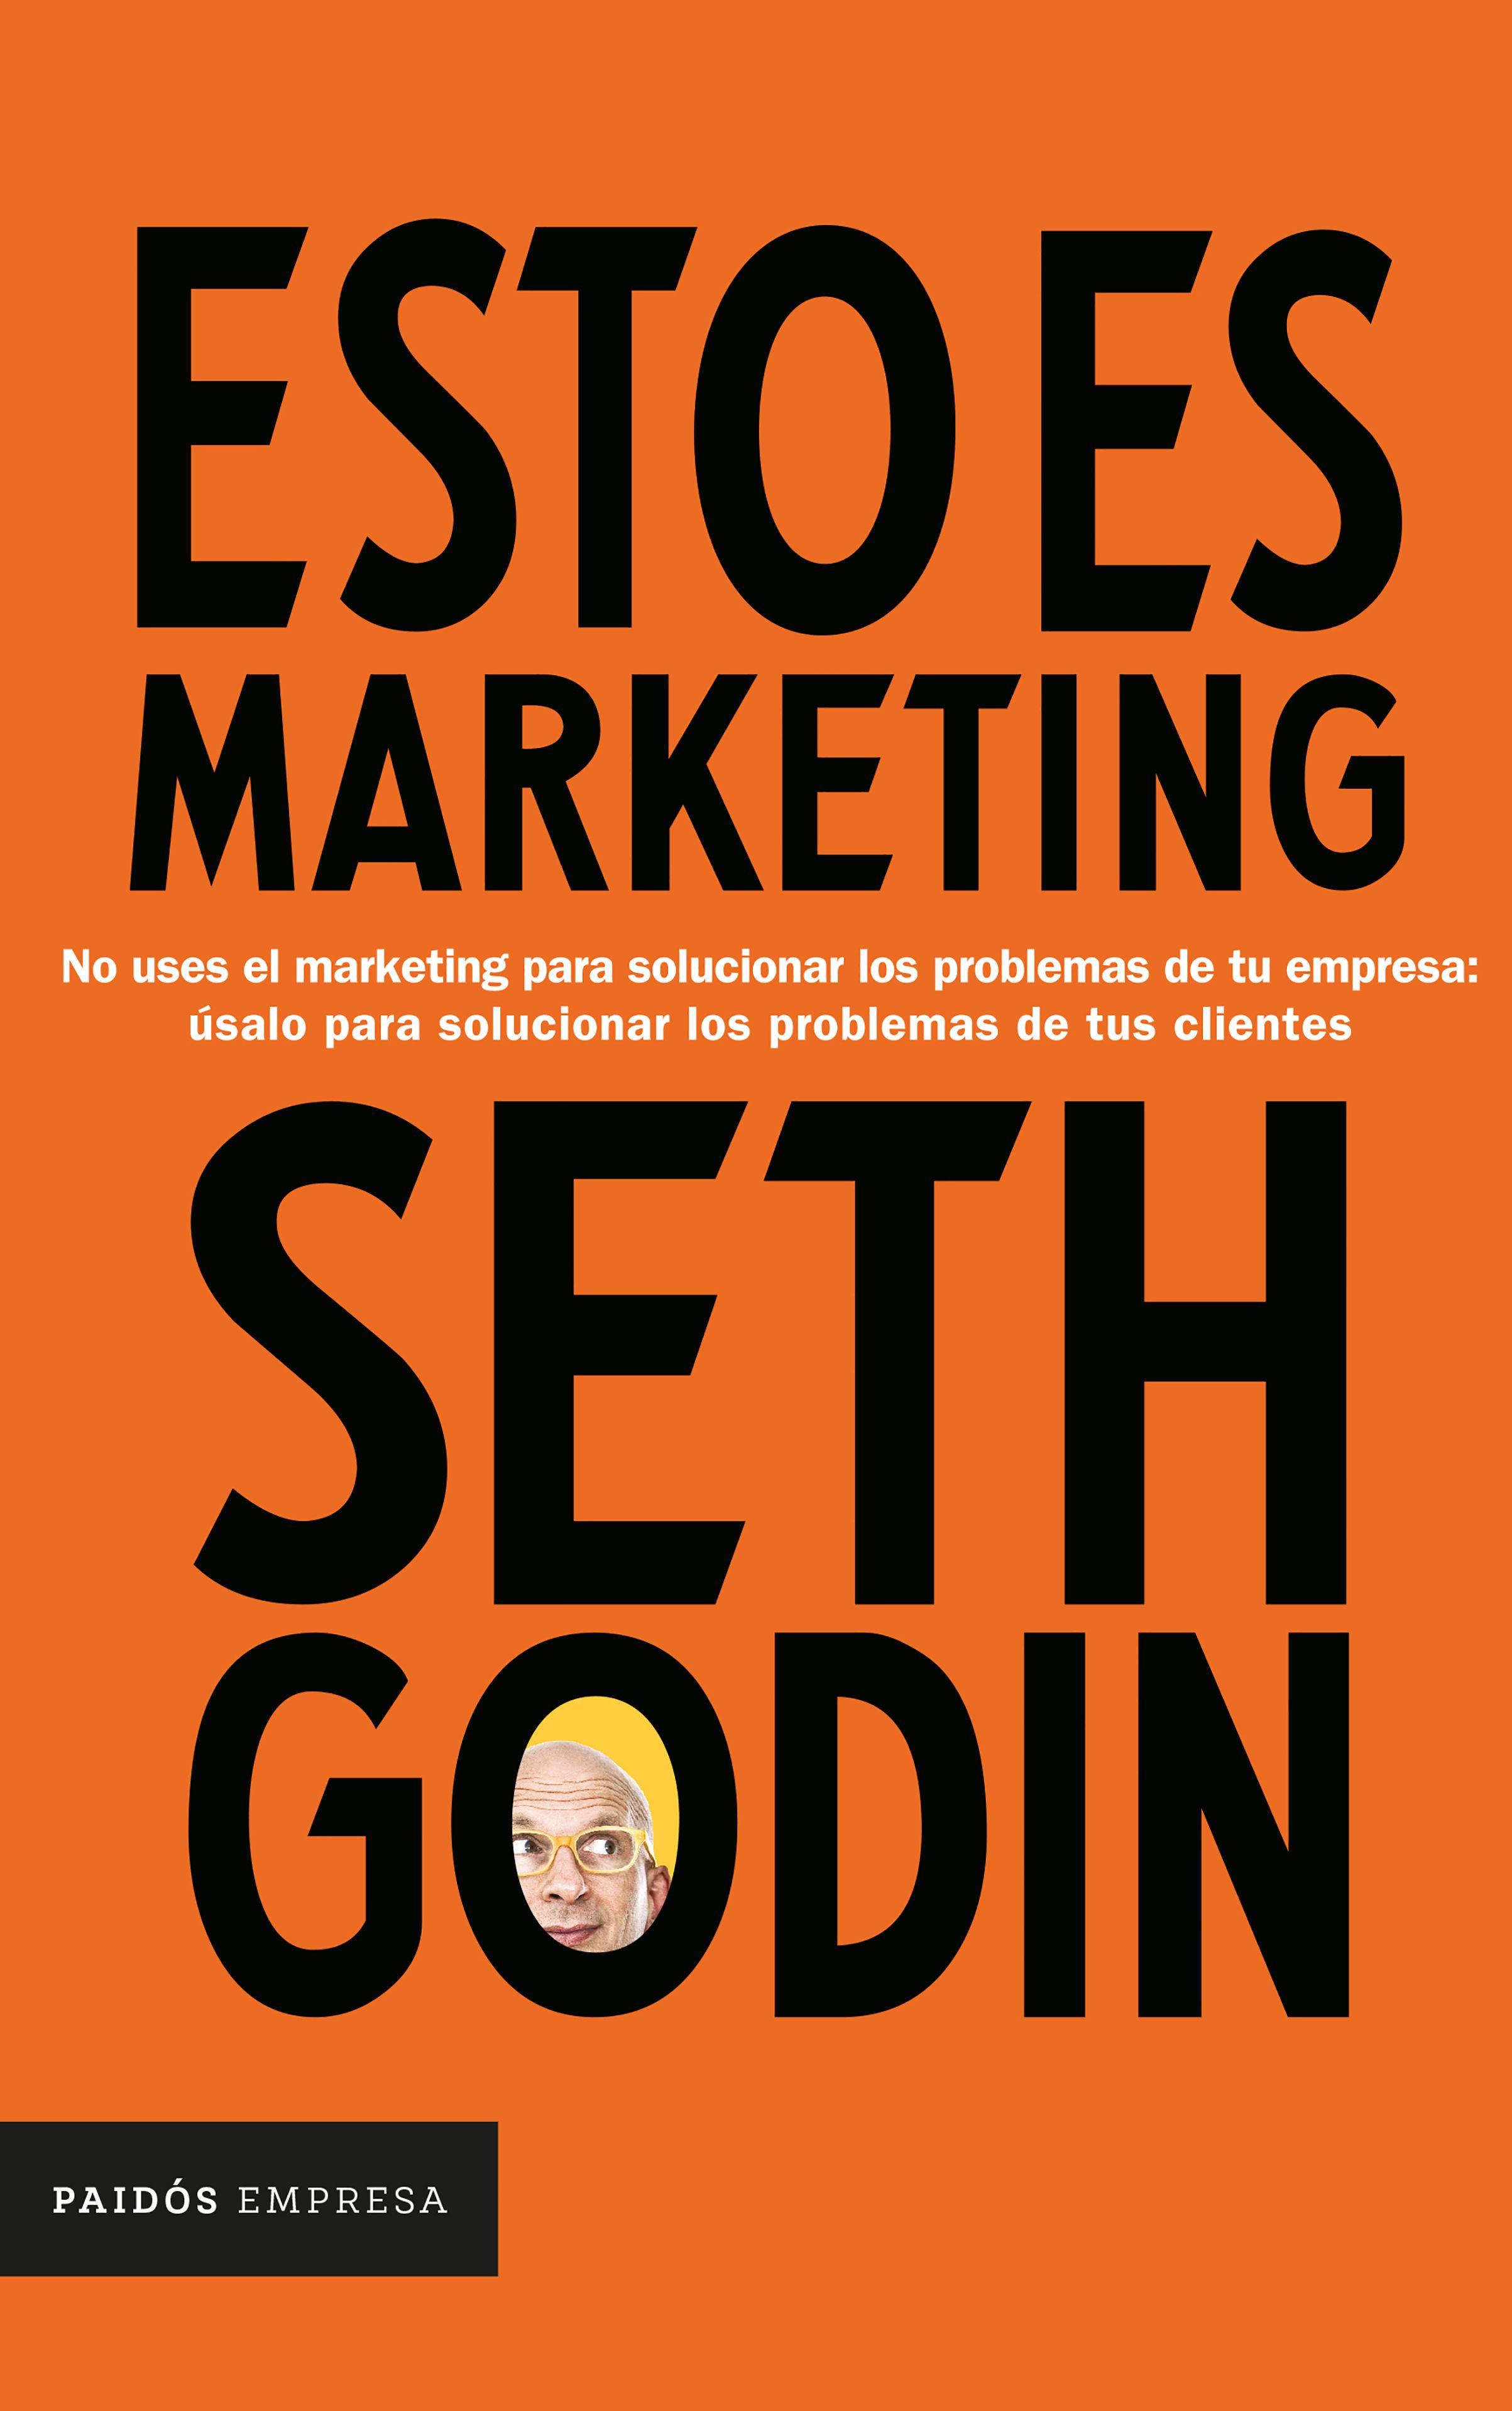 Esto es Marketing - Seth Godin - Paidos